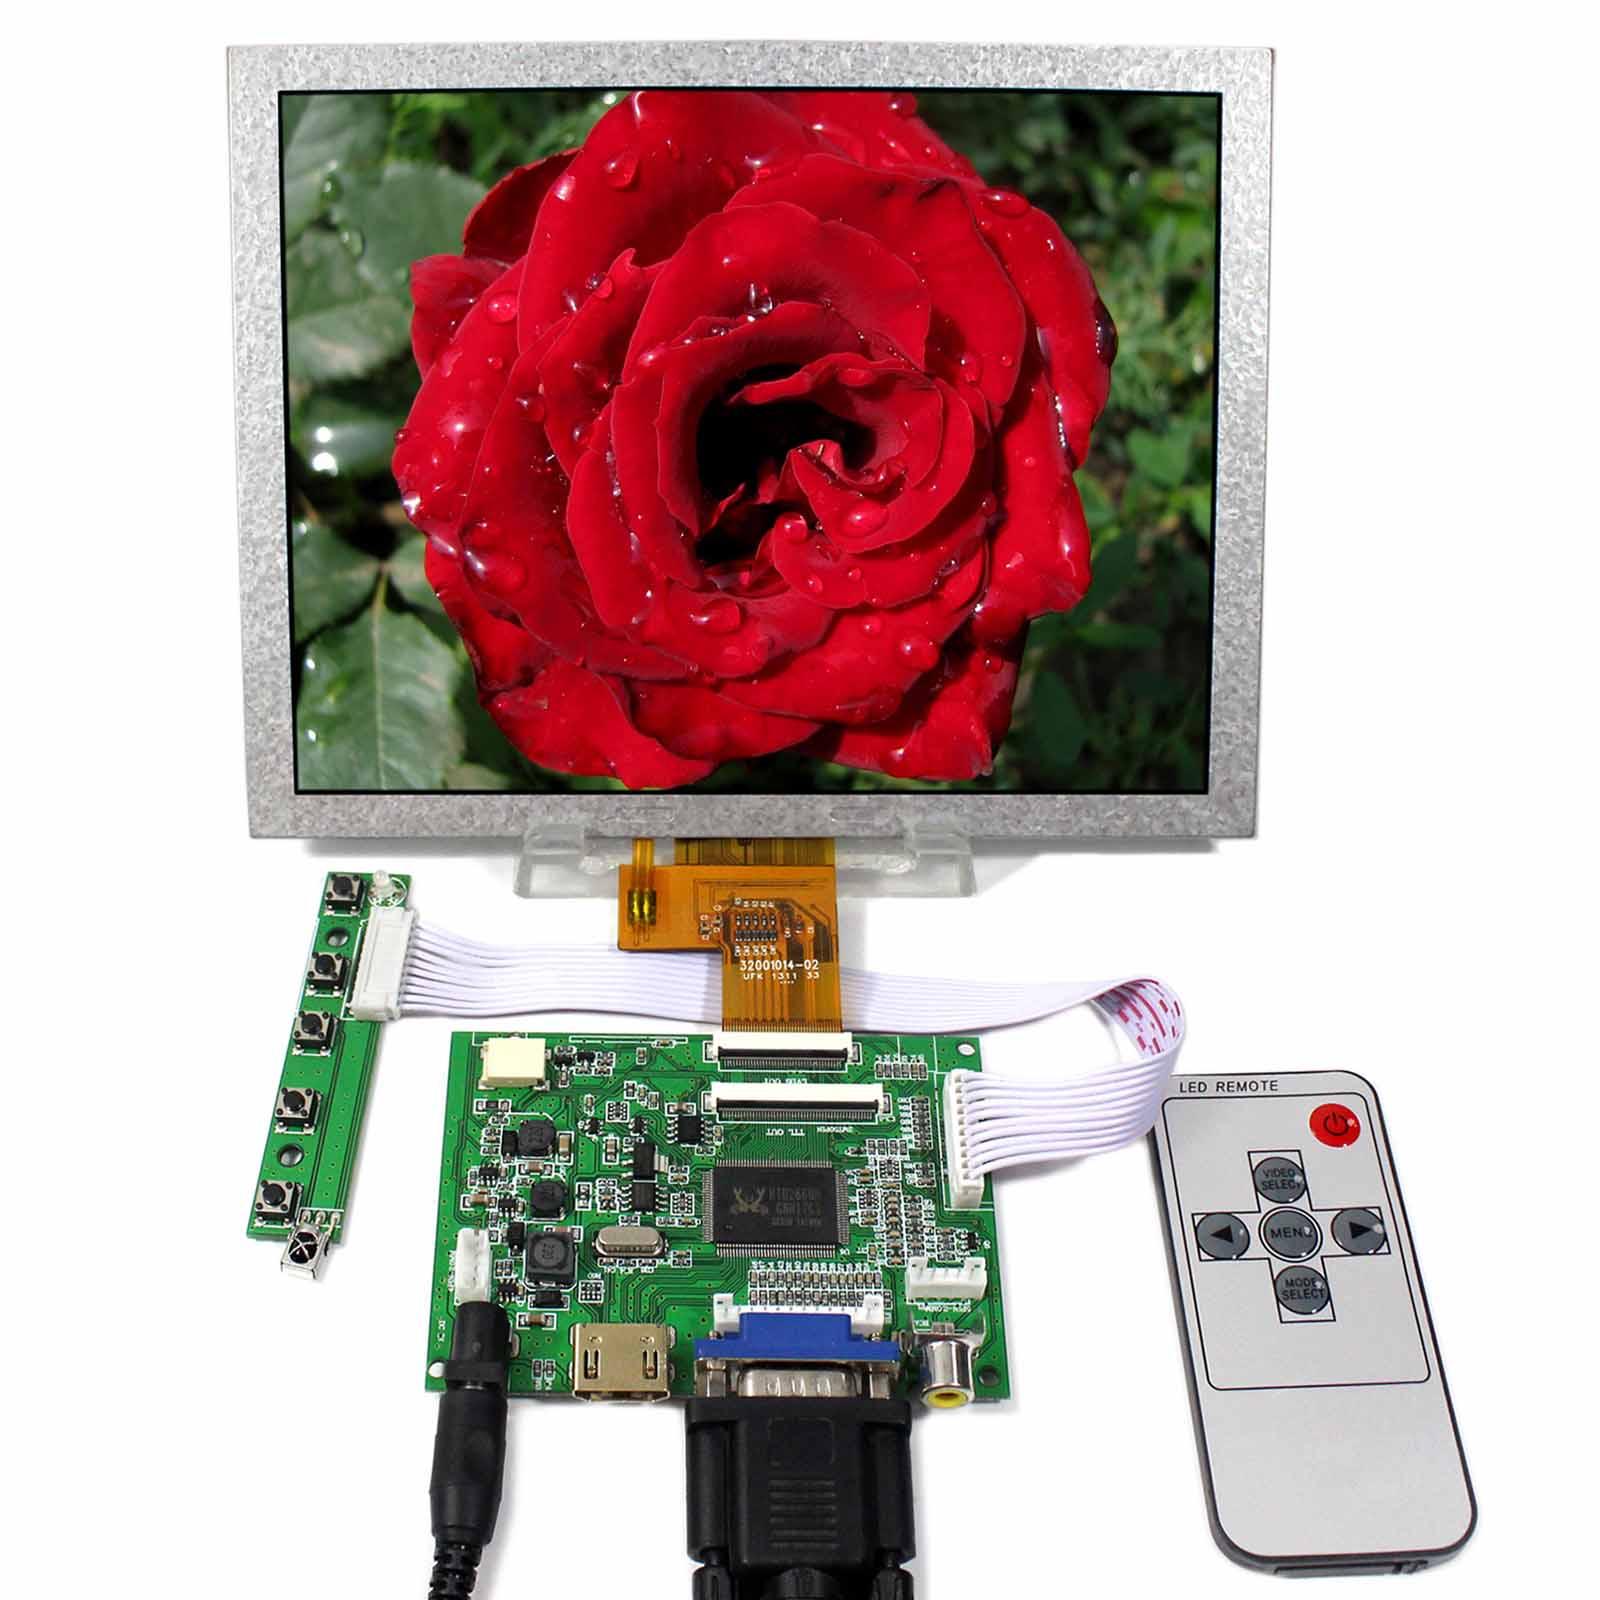 HDMI+VGA+2AV LCD Controller Board VS-TY2662-V5 With 8inch 1024x768 EJ080NA-04C LCD Screen цена и фото